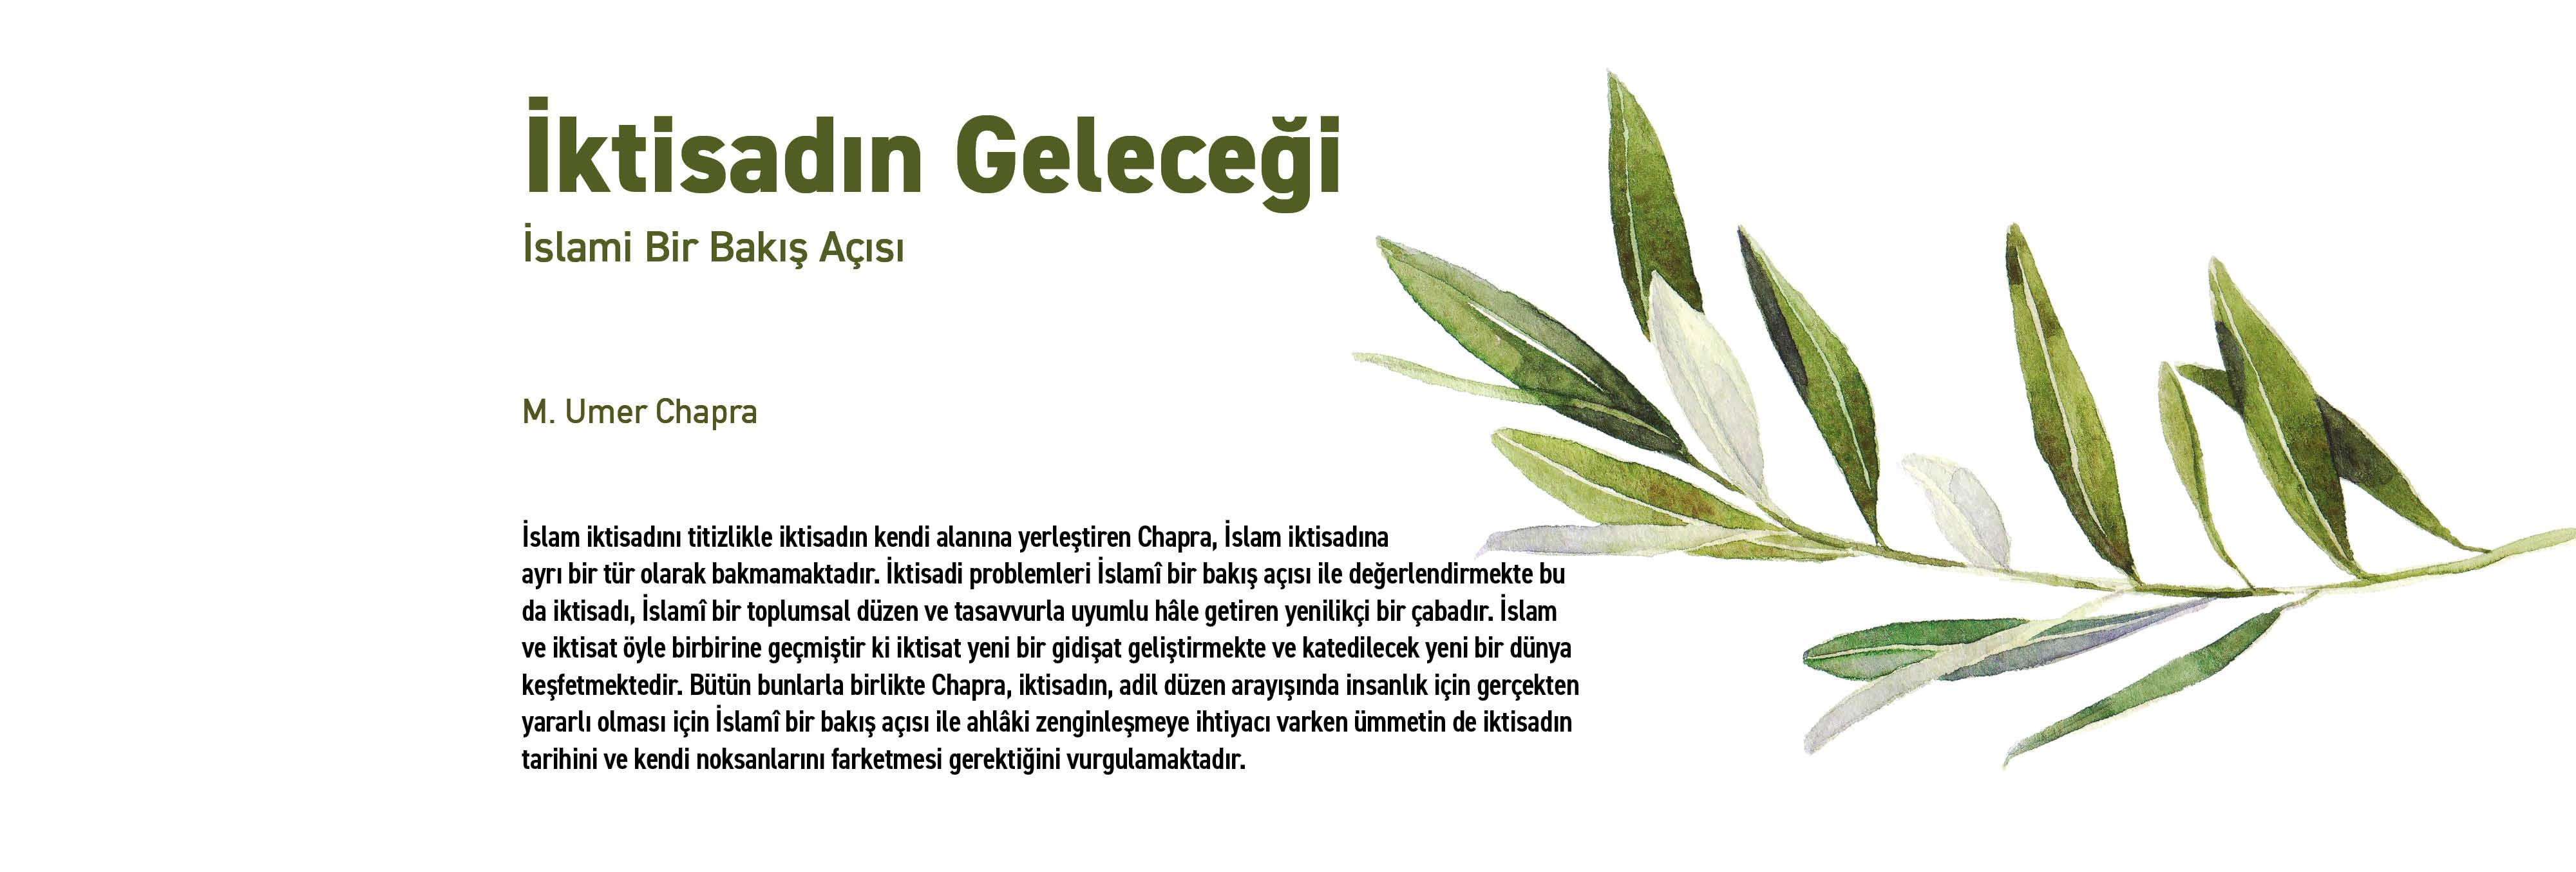 http://www.iktisatyayinlari.com/content/1-home/000005.jpg